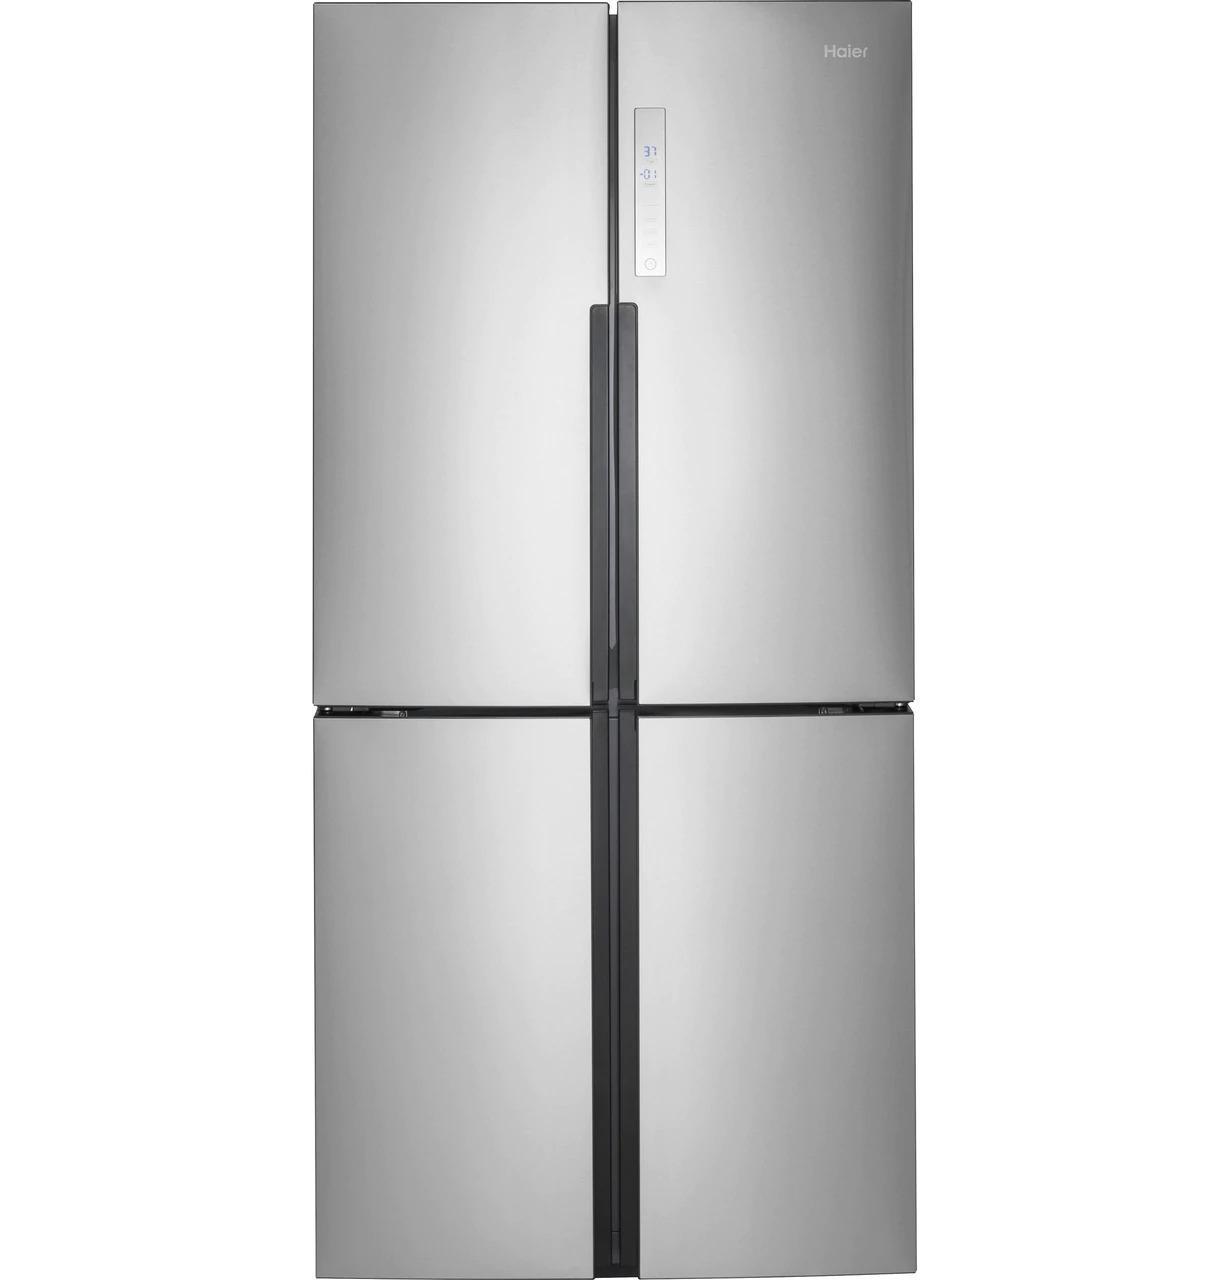 Haier16.4 Cu. Ft. Quad Door Refrigerator